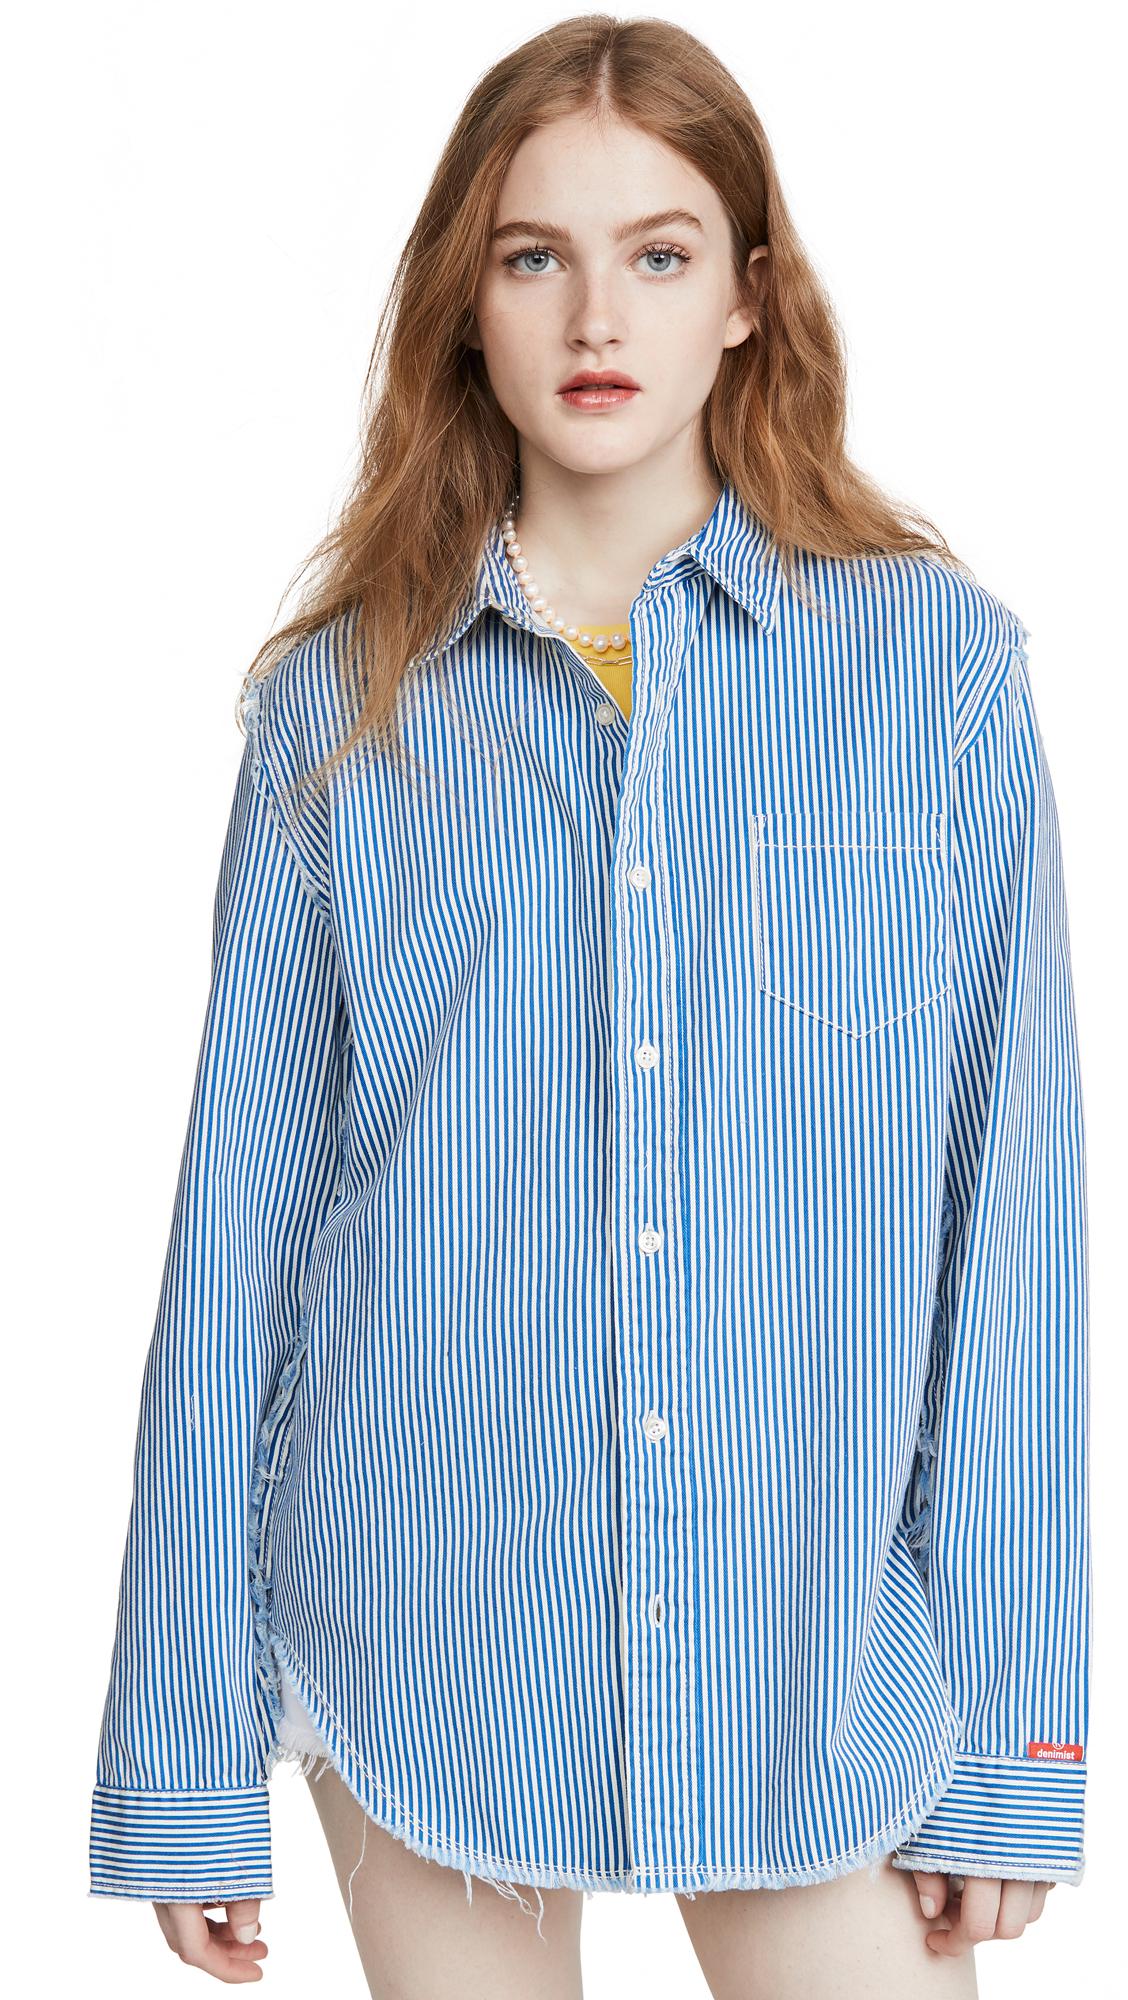 Denimist Frayed Edge Shirt - 30% Off Sale